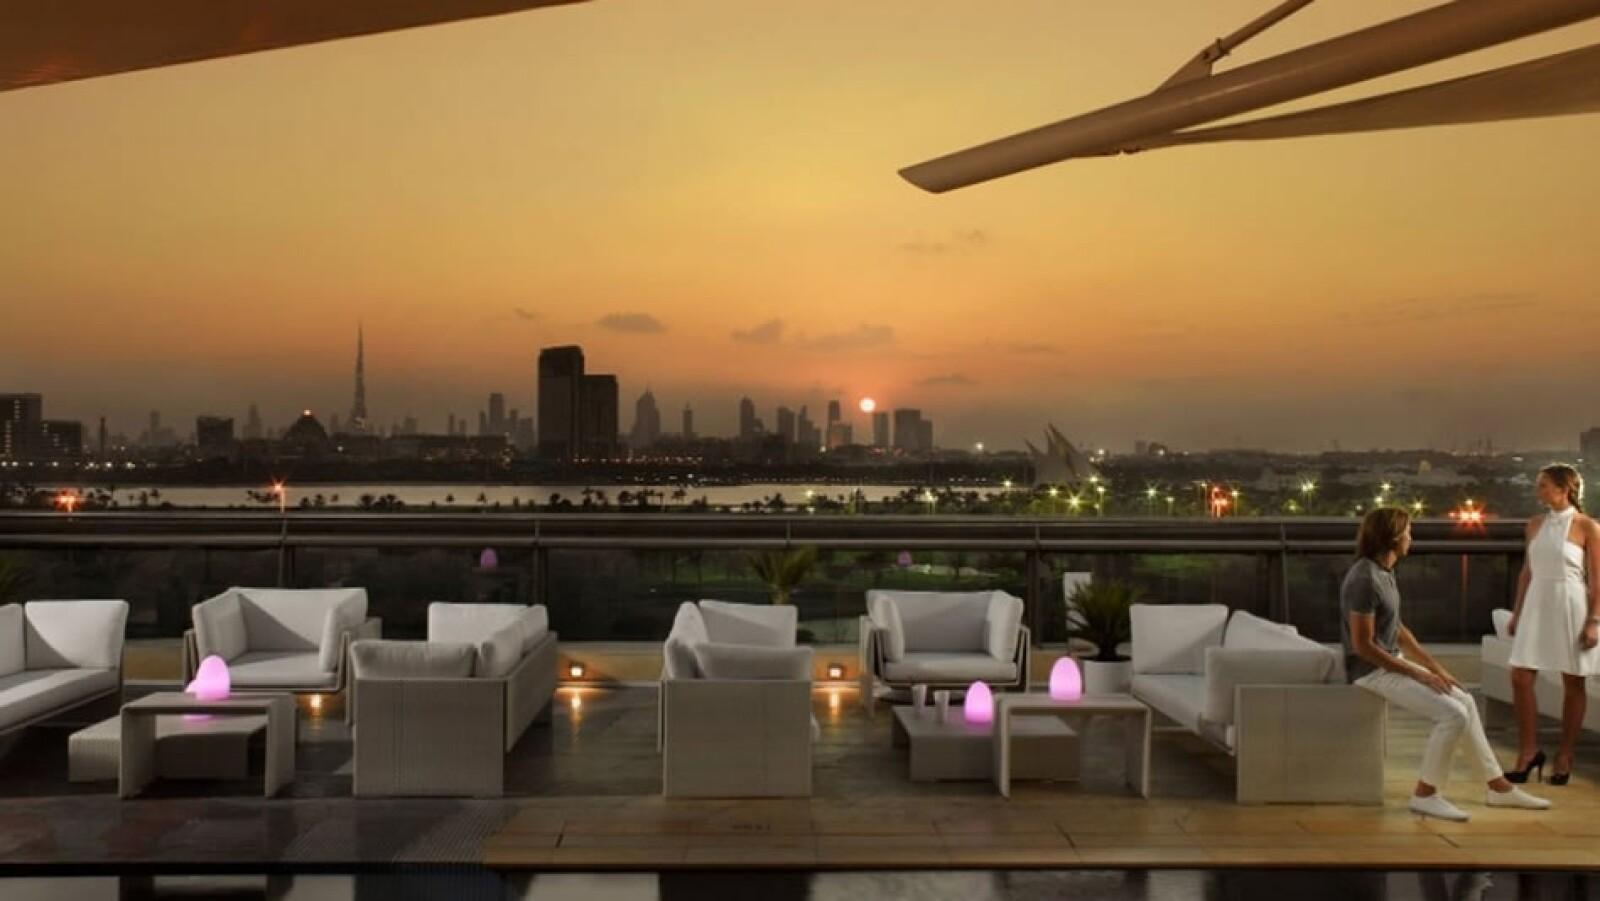 Cu-ba, Hotel Jumeirah Creekside (Dubái, EAU)